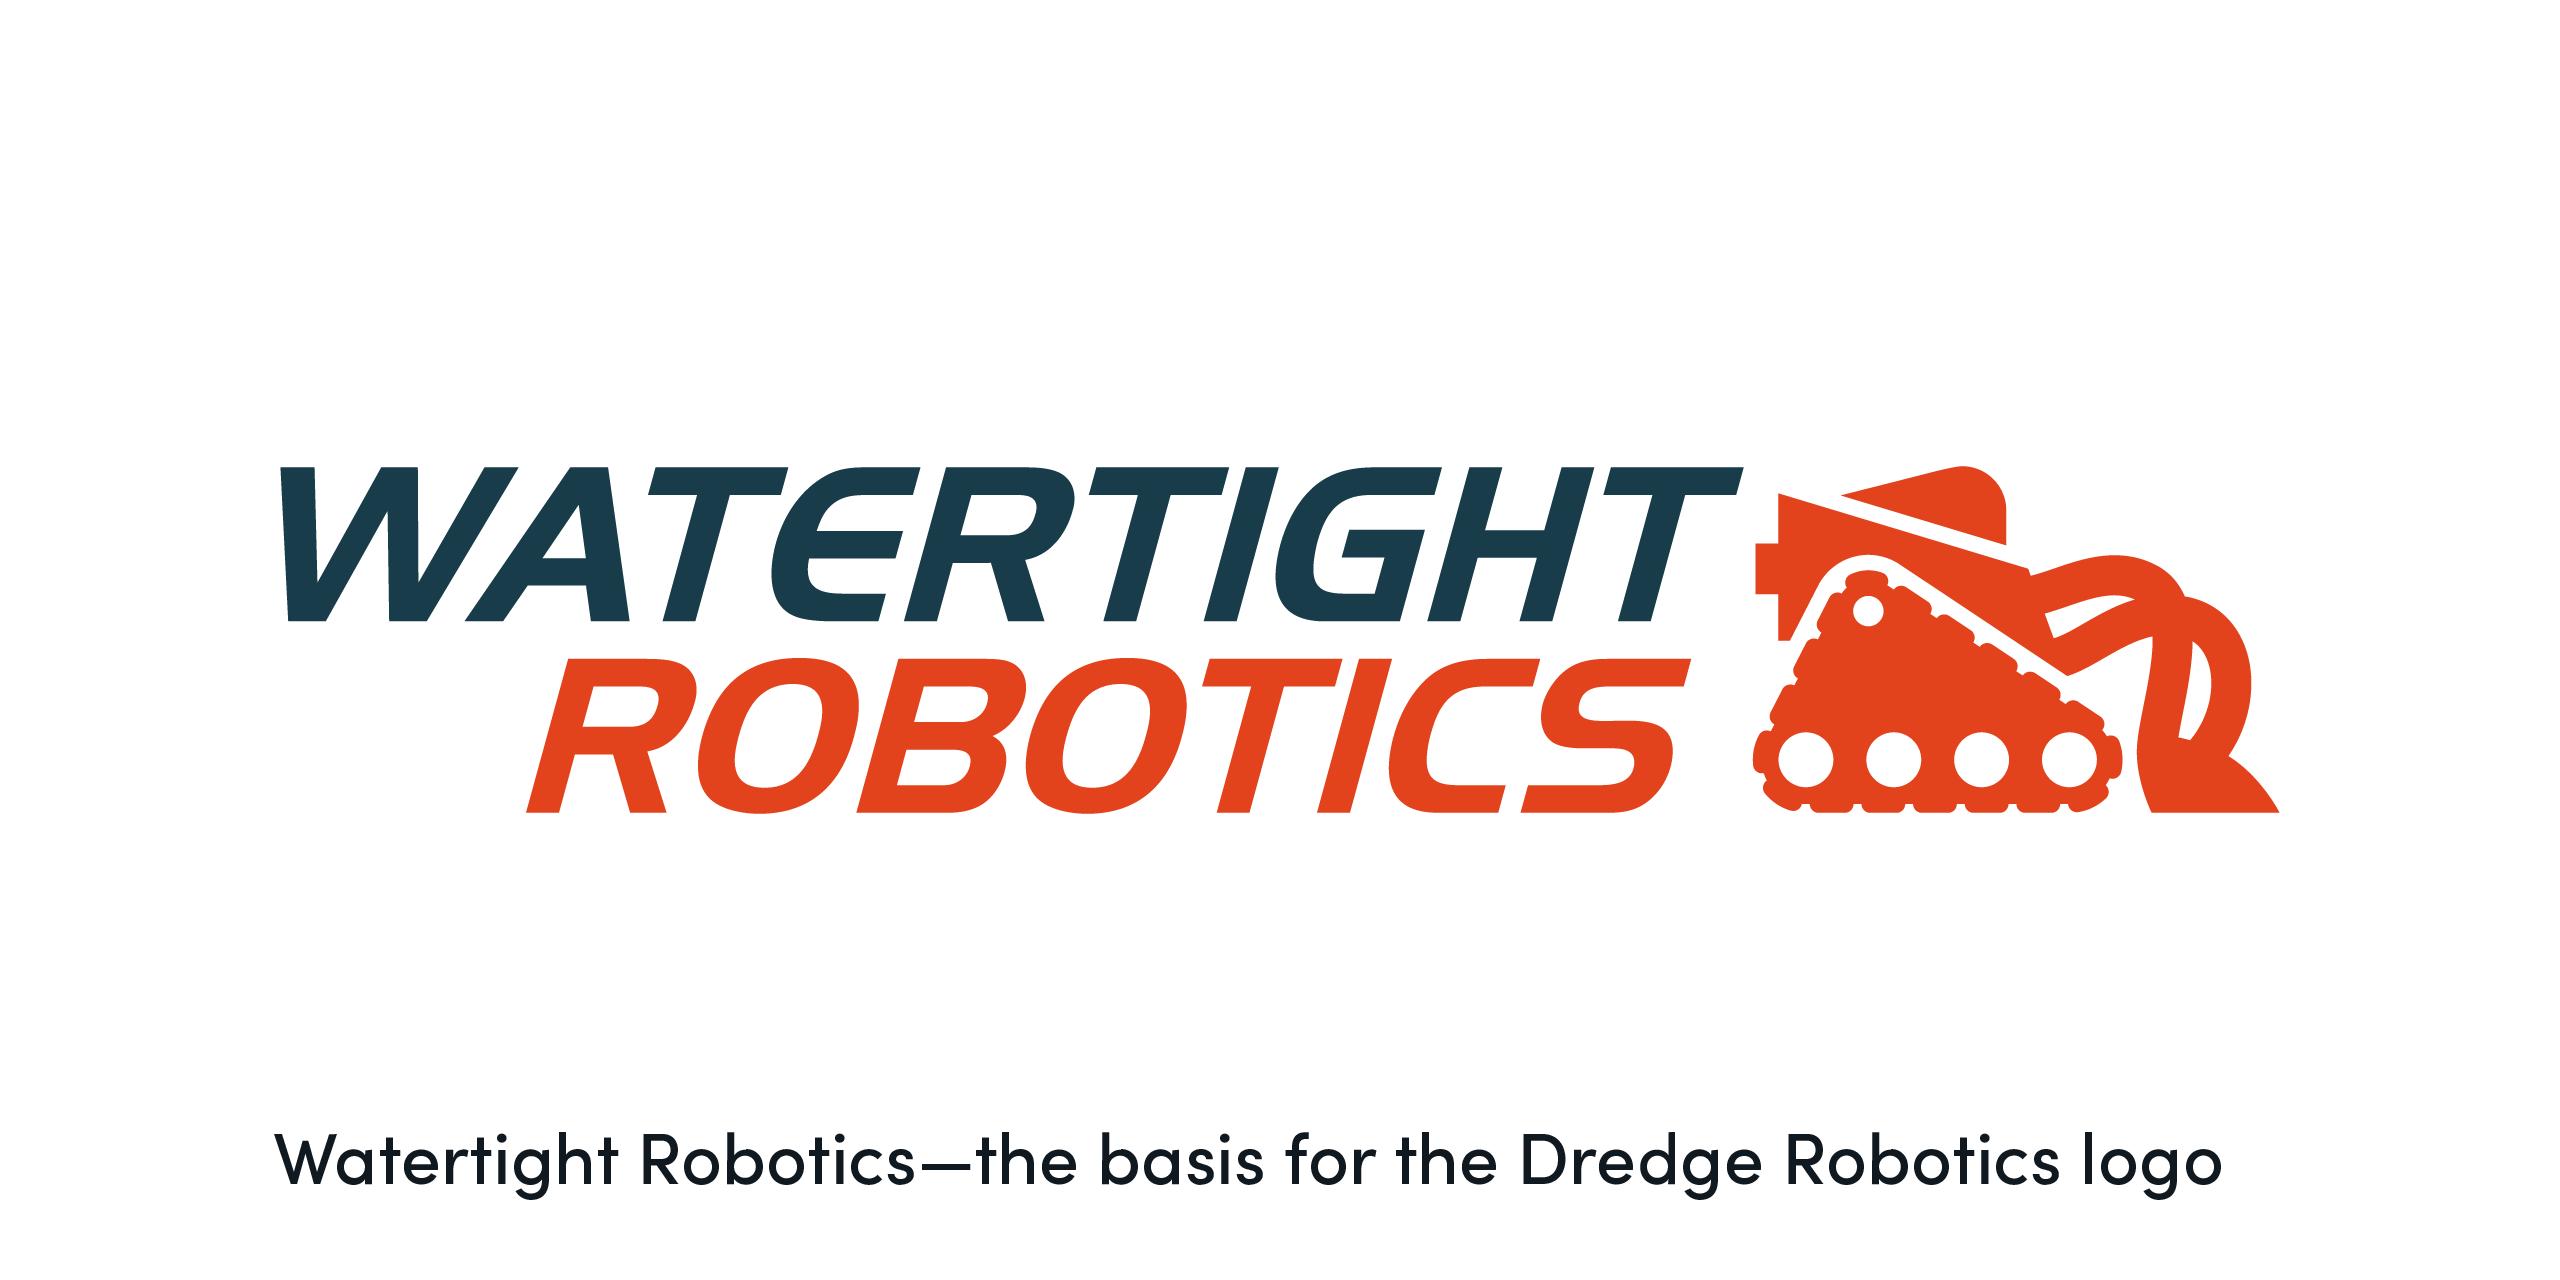 watertight robotics logo design crux